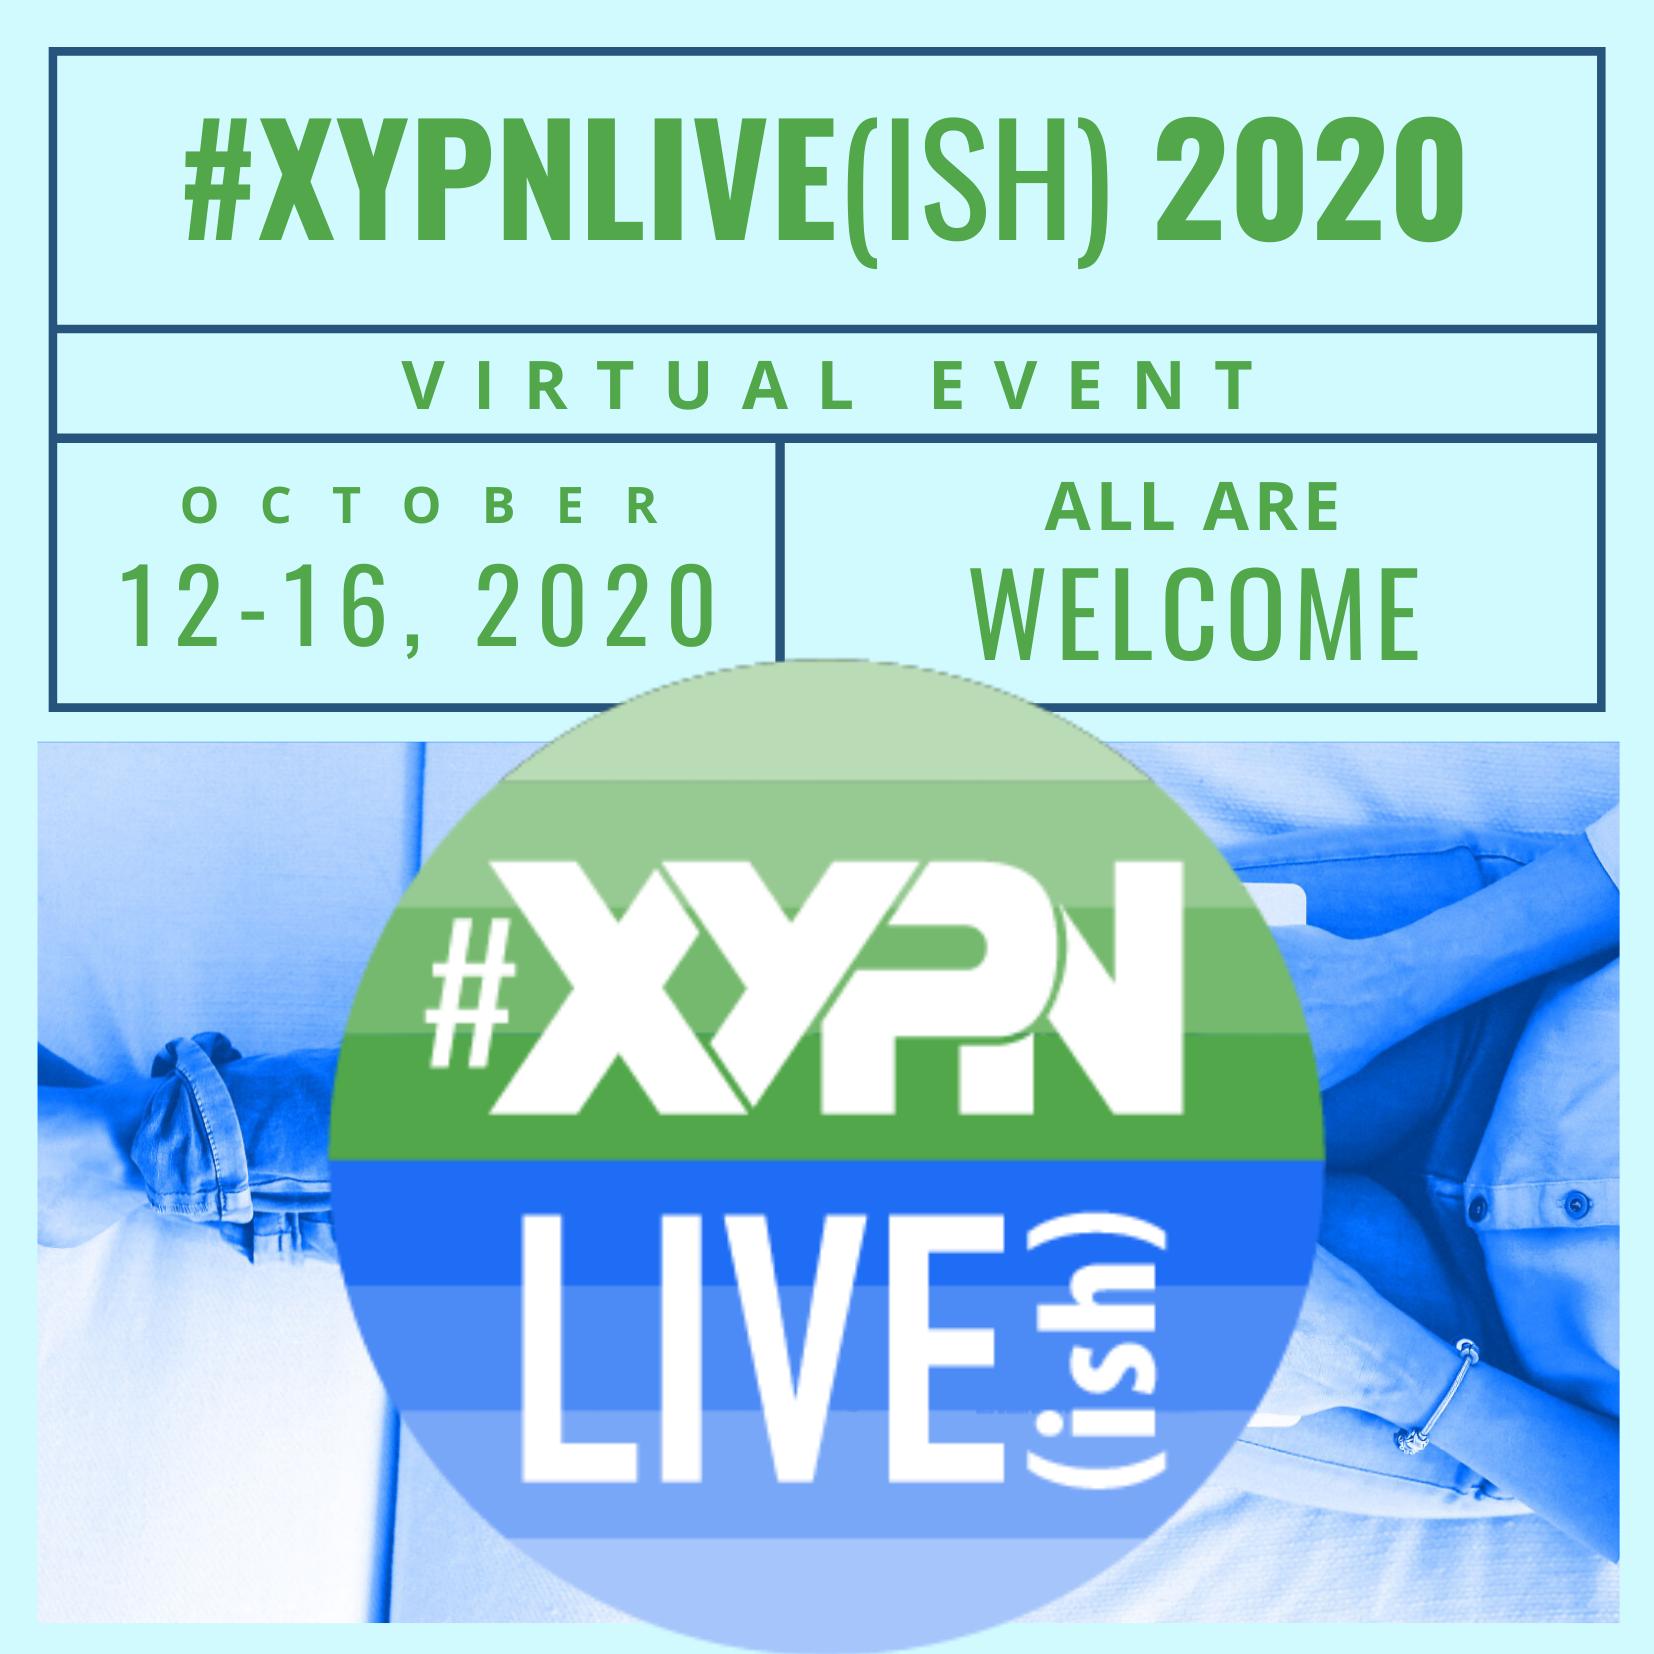 #XYPNLIVE(ish)